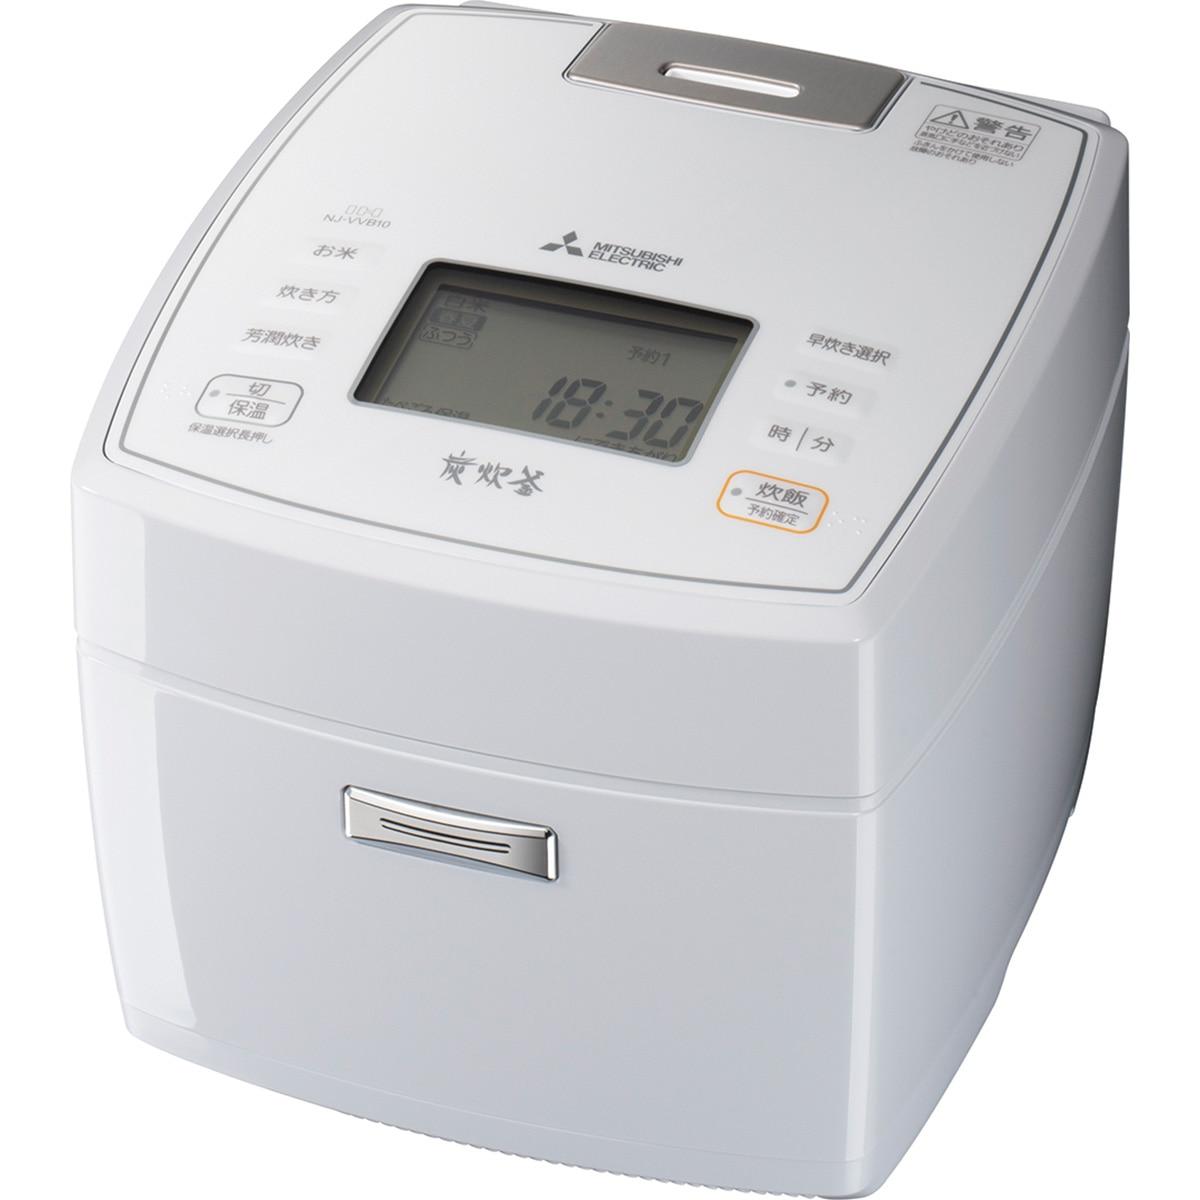 三菱電機 IH炊飯器 炭炊釜 5.5合炊き 月白 NJ-VVB10-W